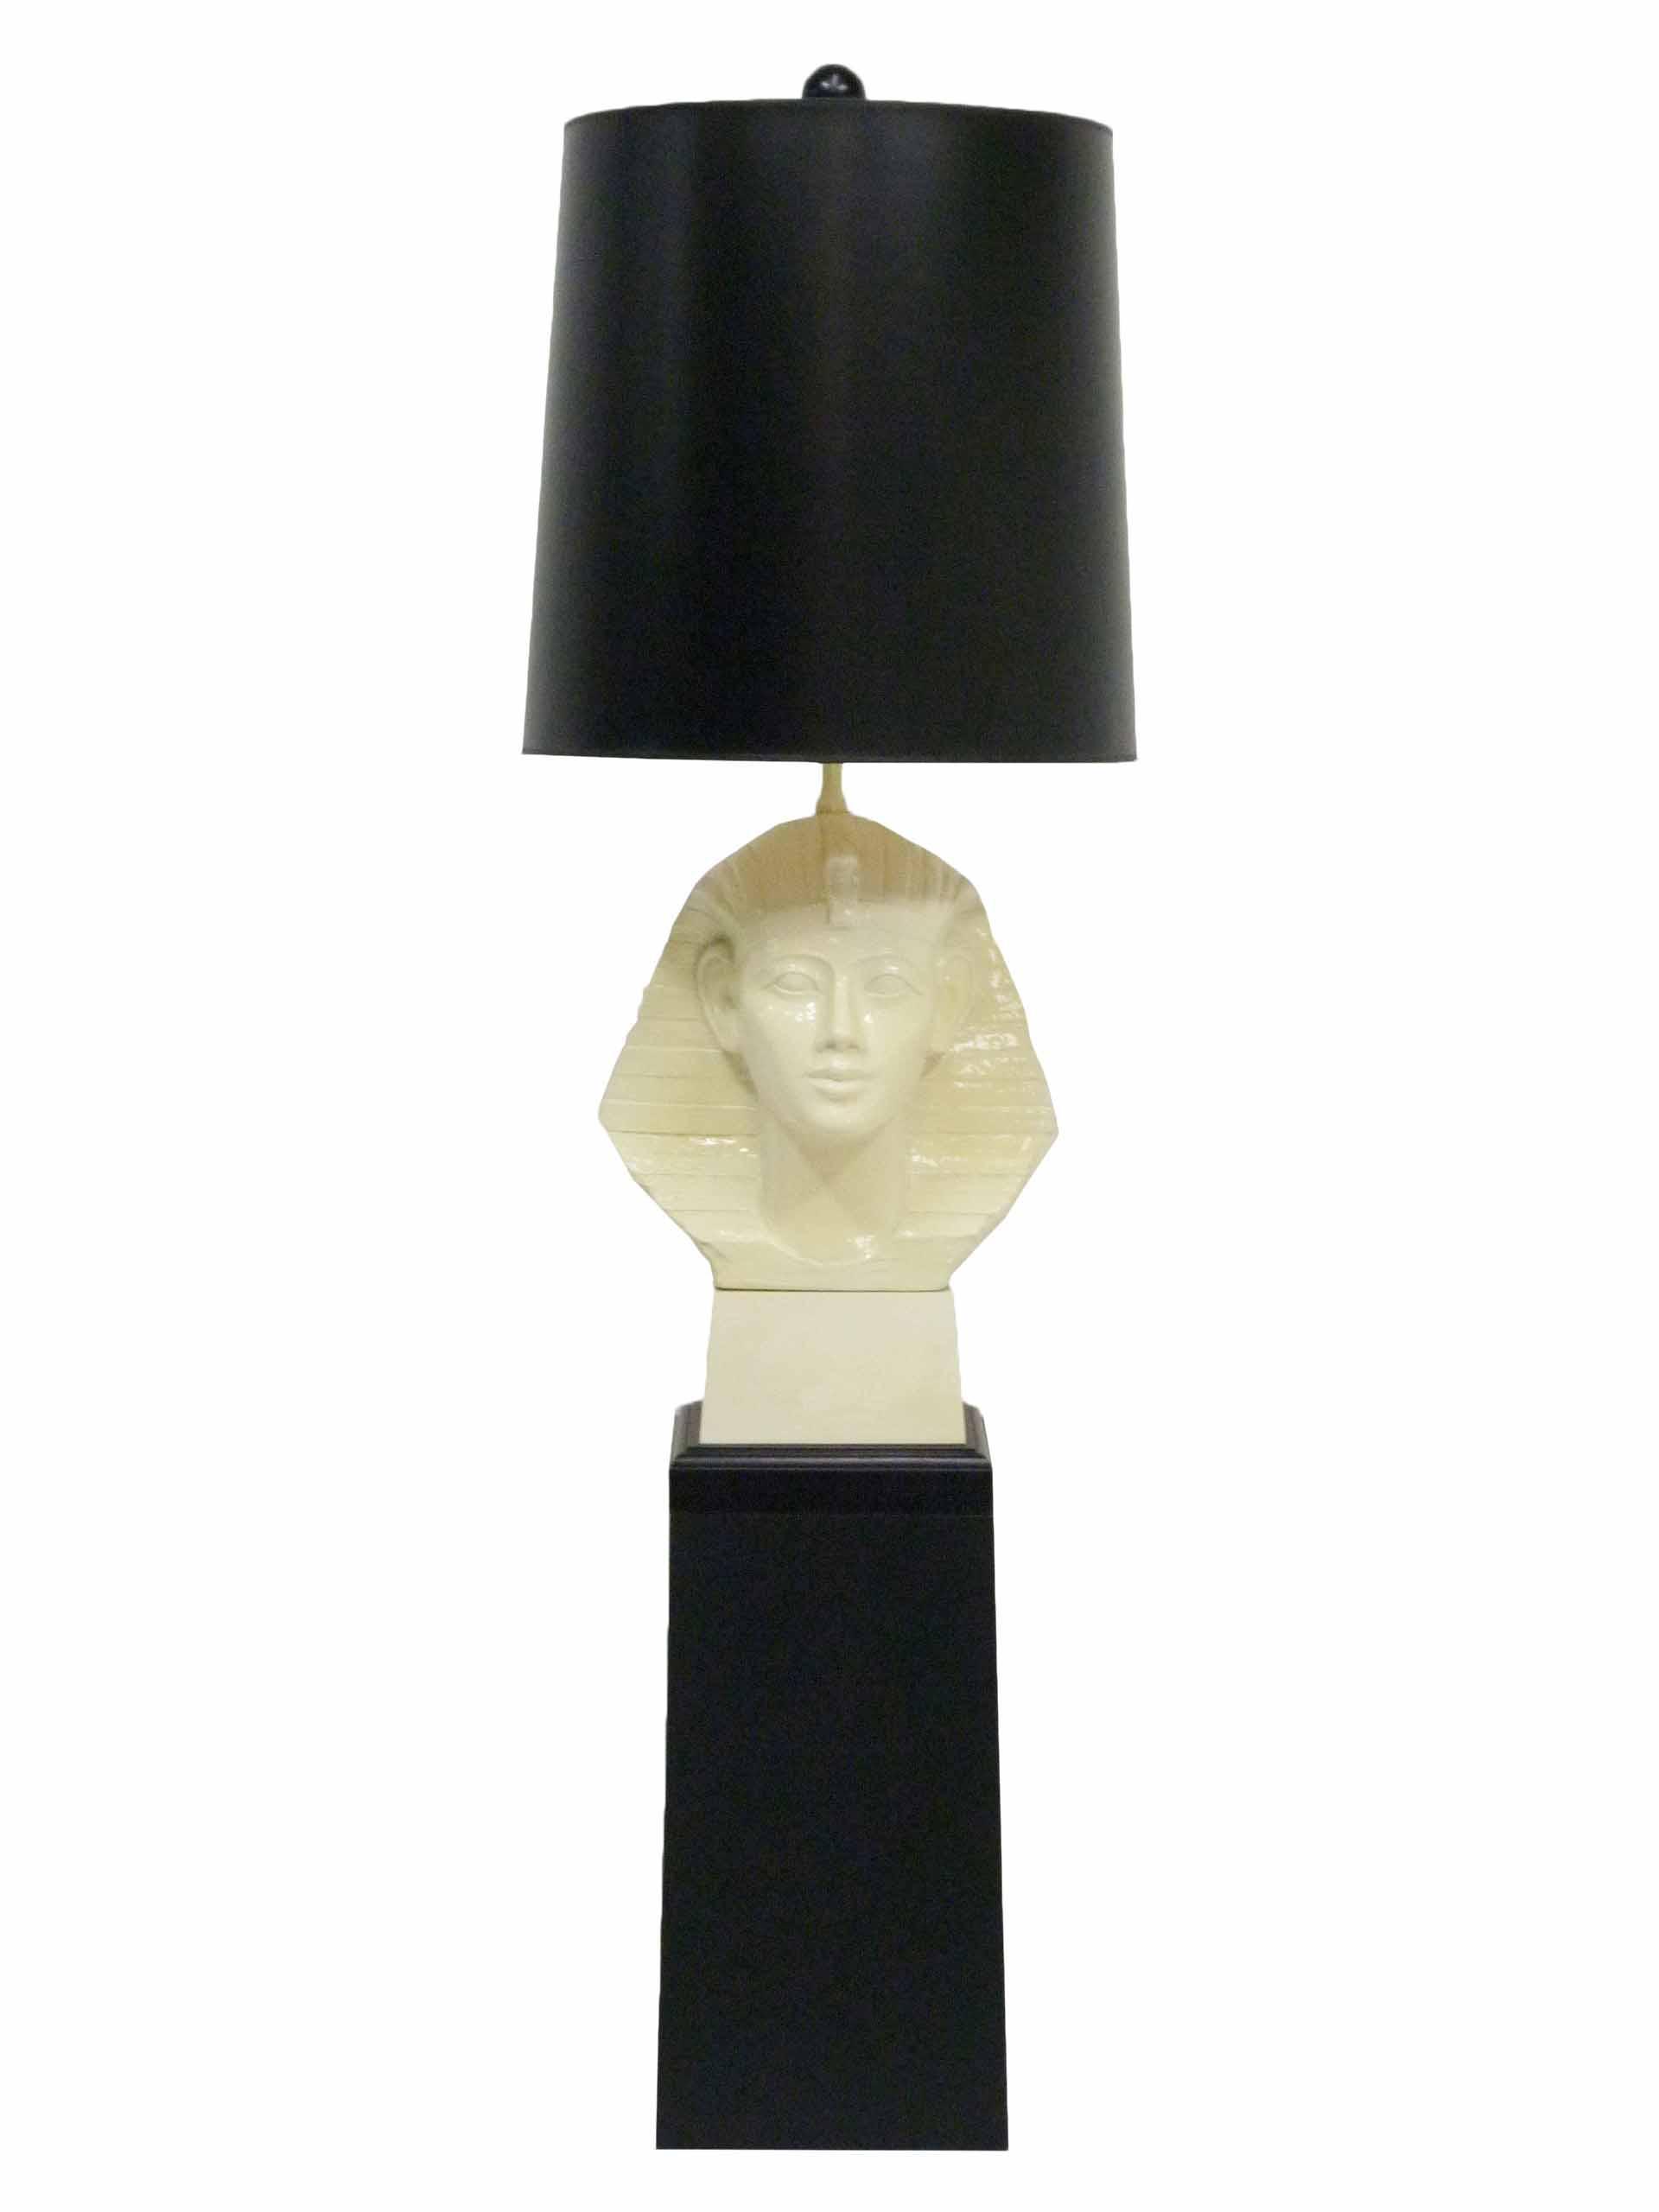 Paul hansen egyptian pharaoh table lamp pedestal chairish aloadofball Images